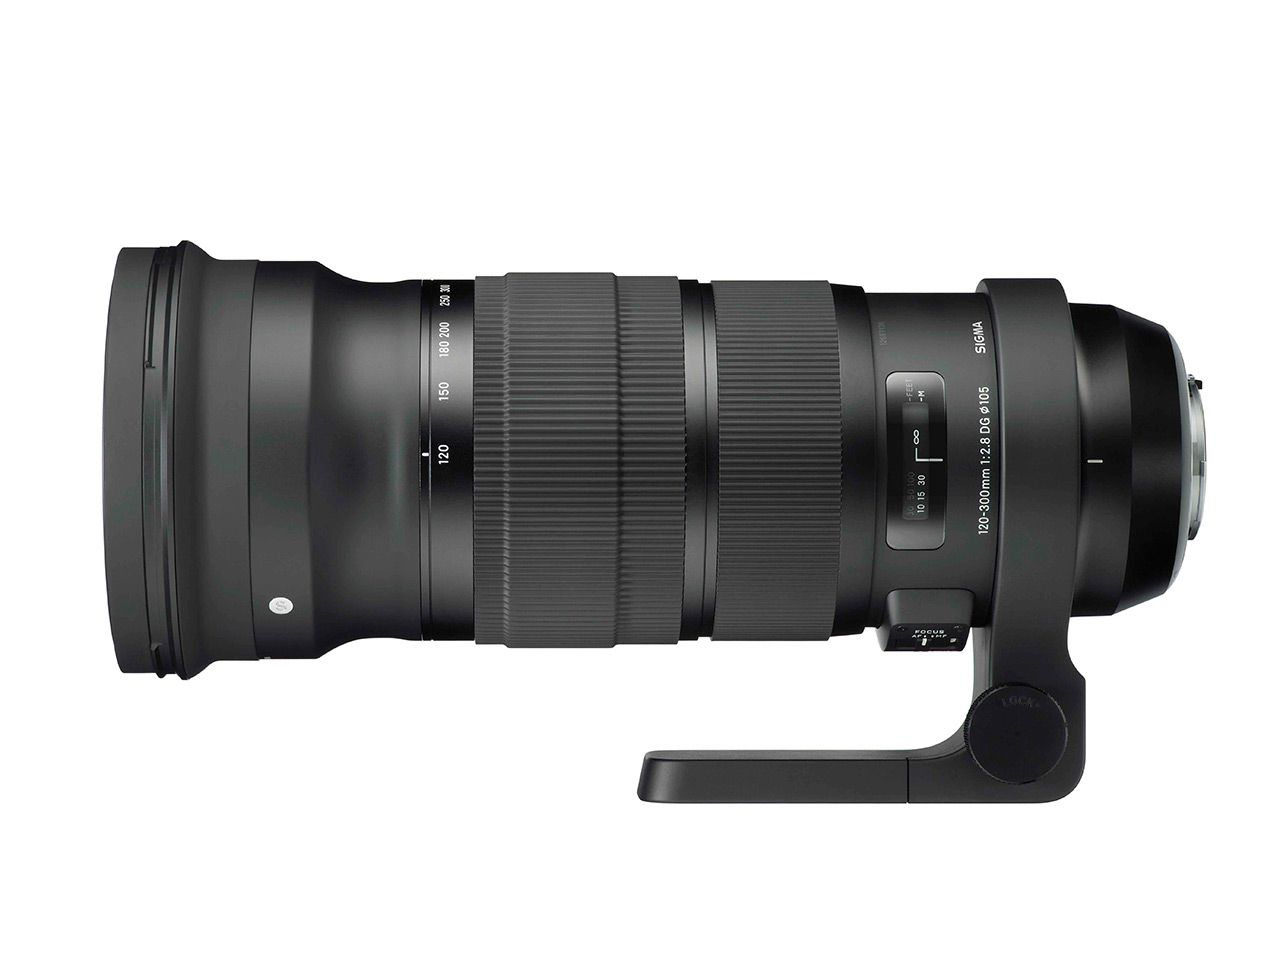 Sigma 120-300mm f/2.8 DG OS HSM.Foto: Sigma